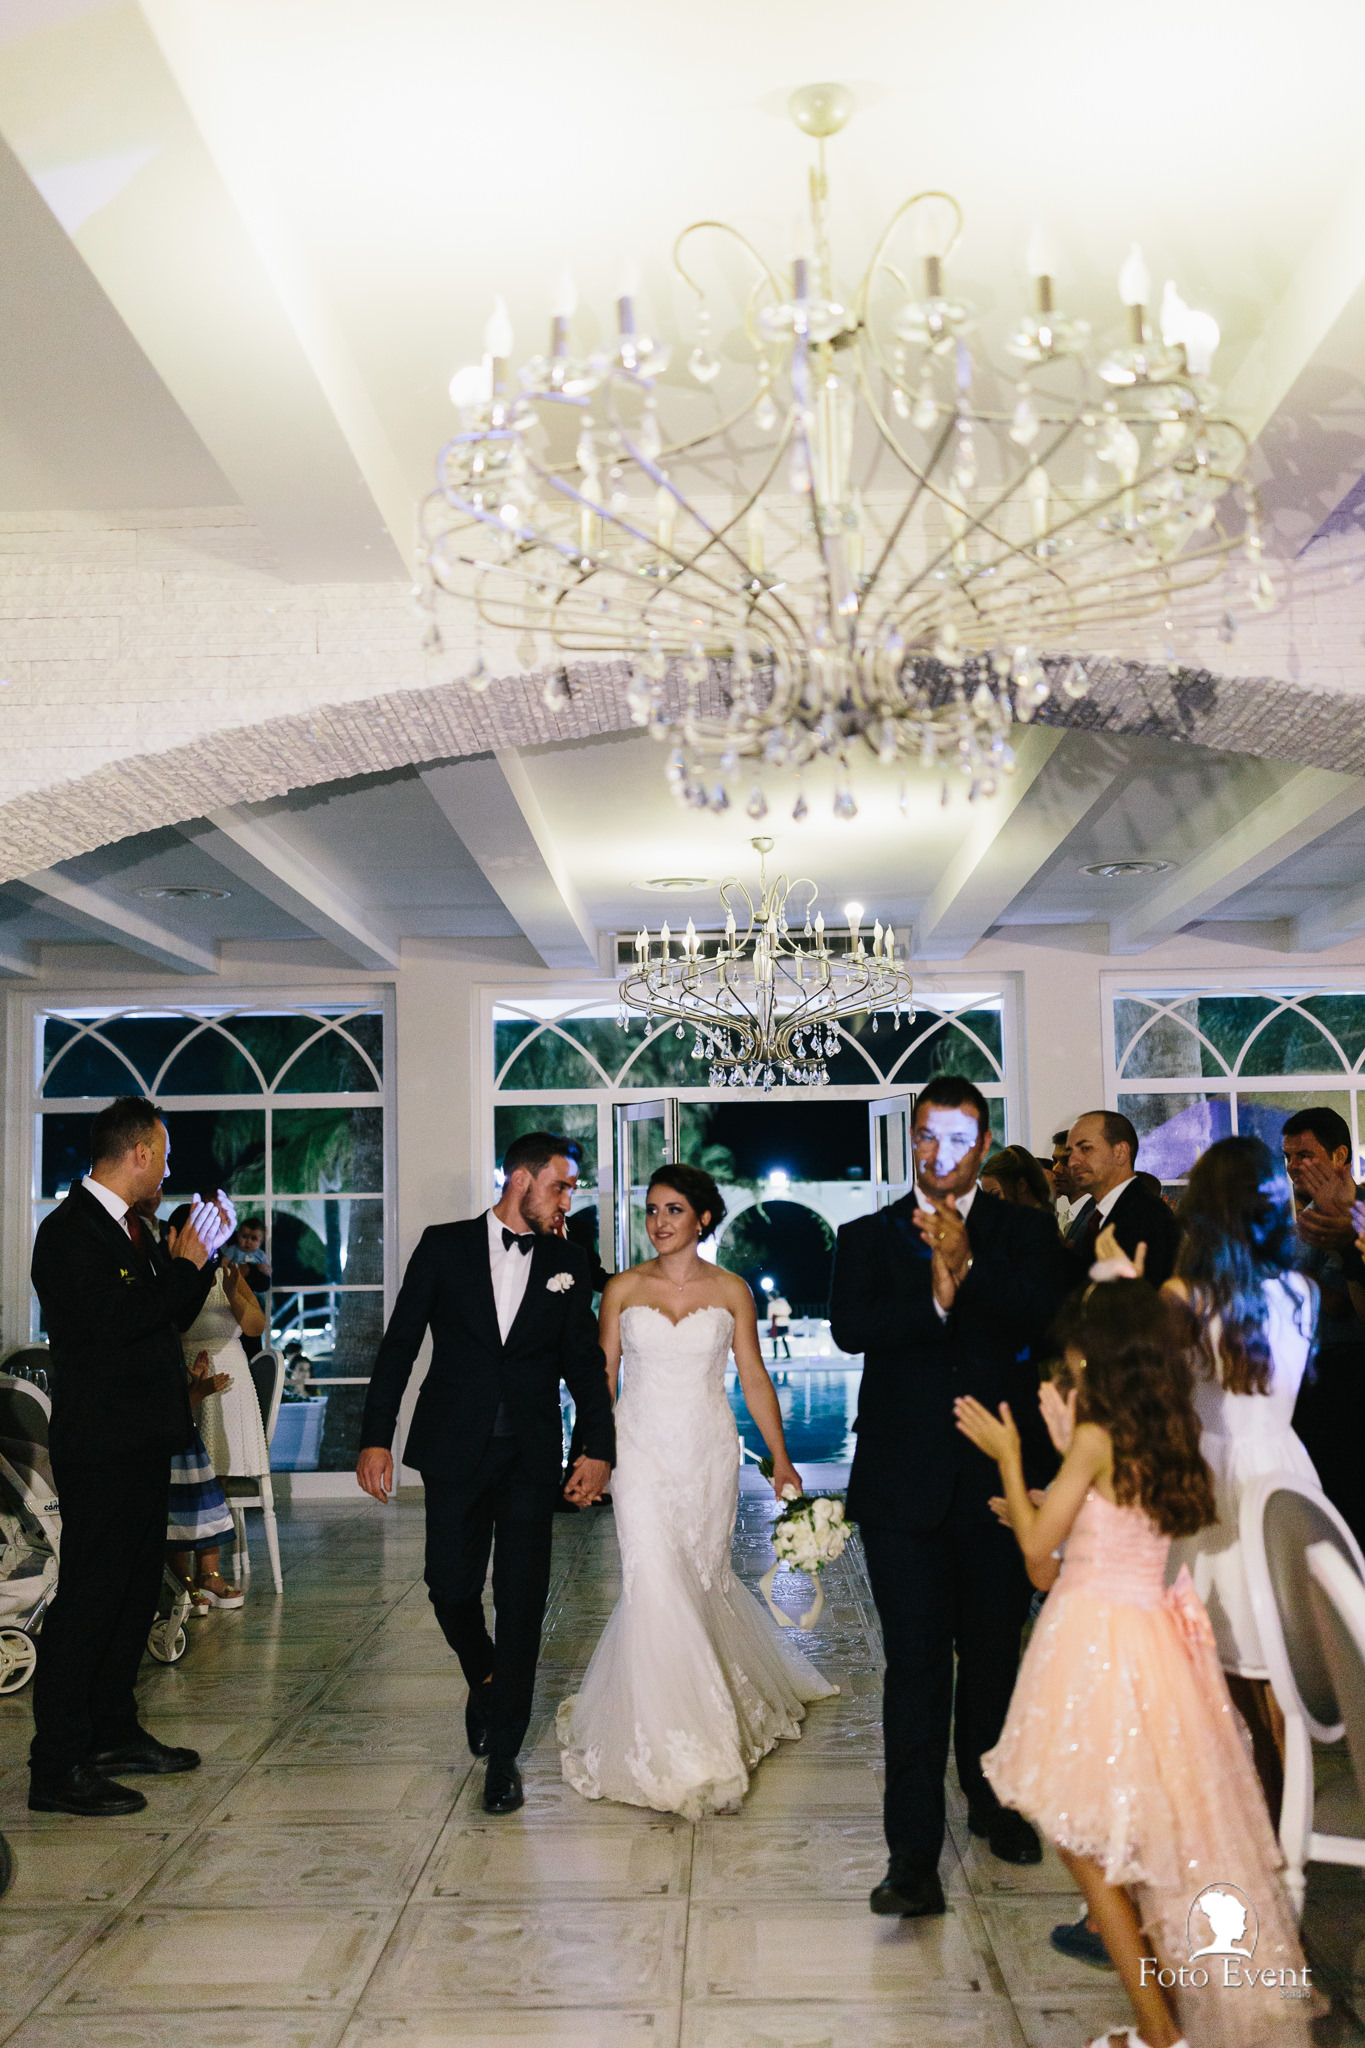 050-2019-08-31-Matrimonio-Serena-e-Saverio-Tarantino-zoom-556